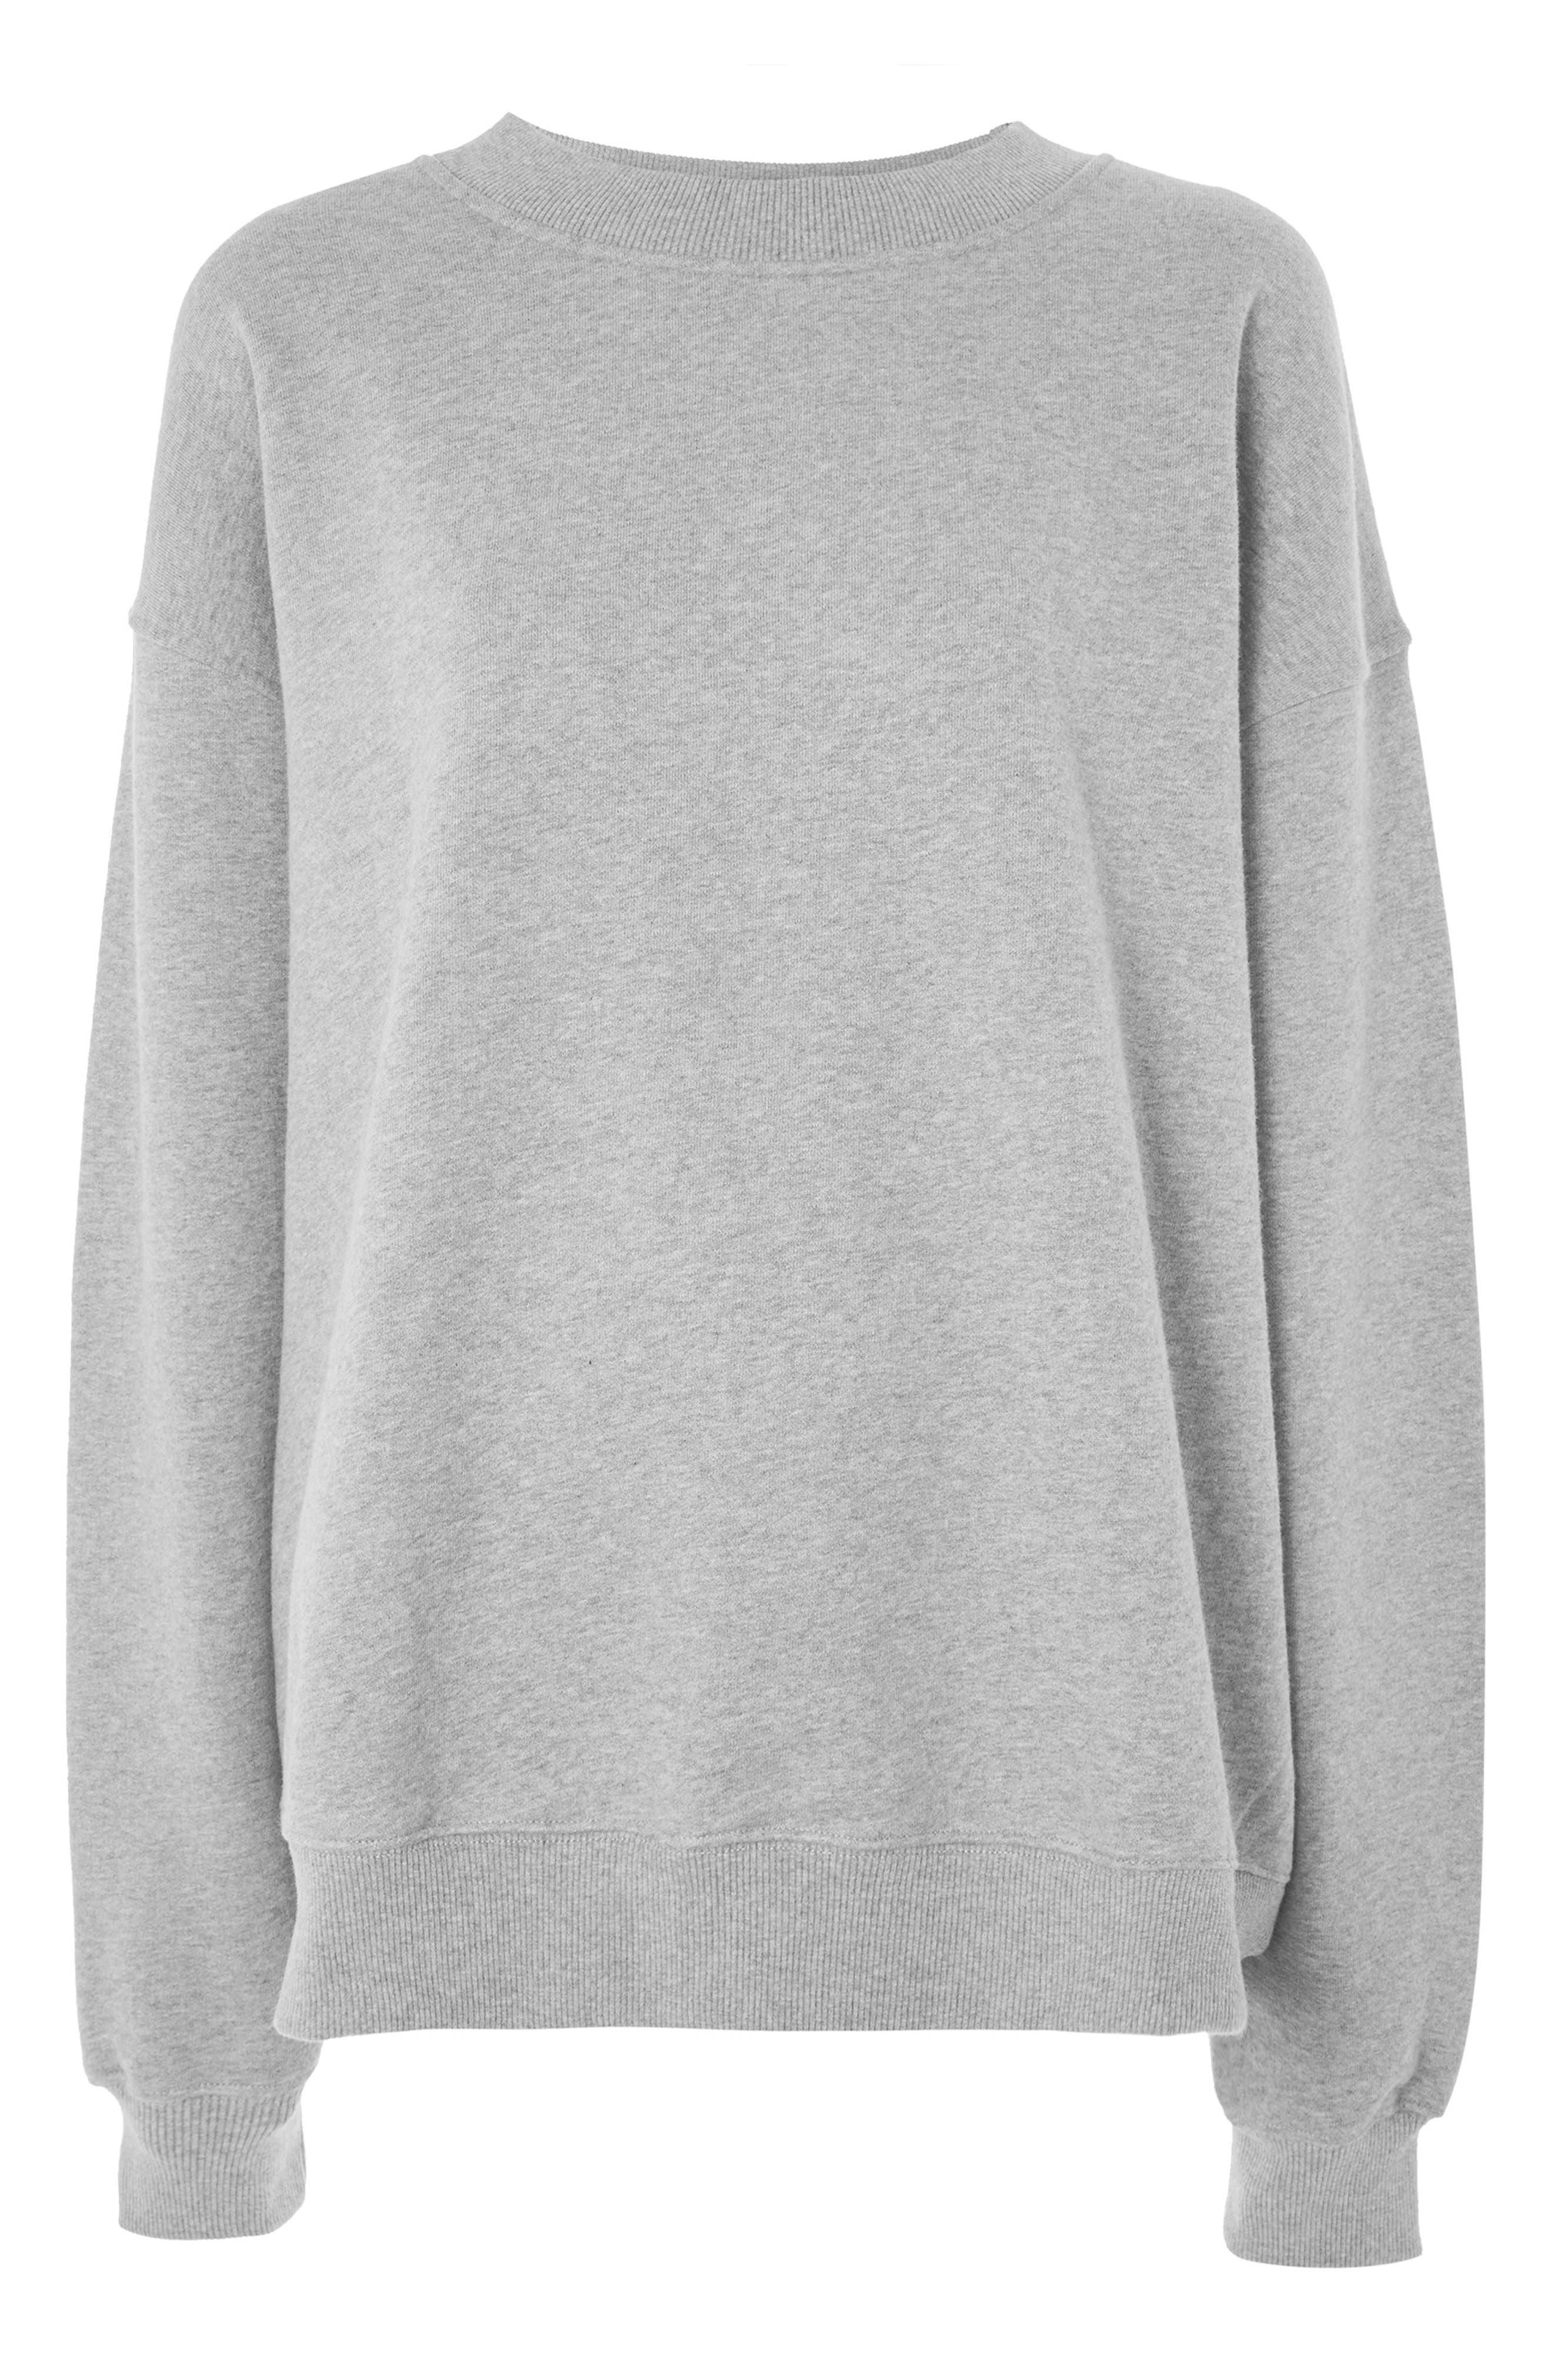 Oversize Sweatshirt,                             Main thumbnail 1, color,                             020